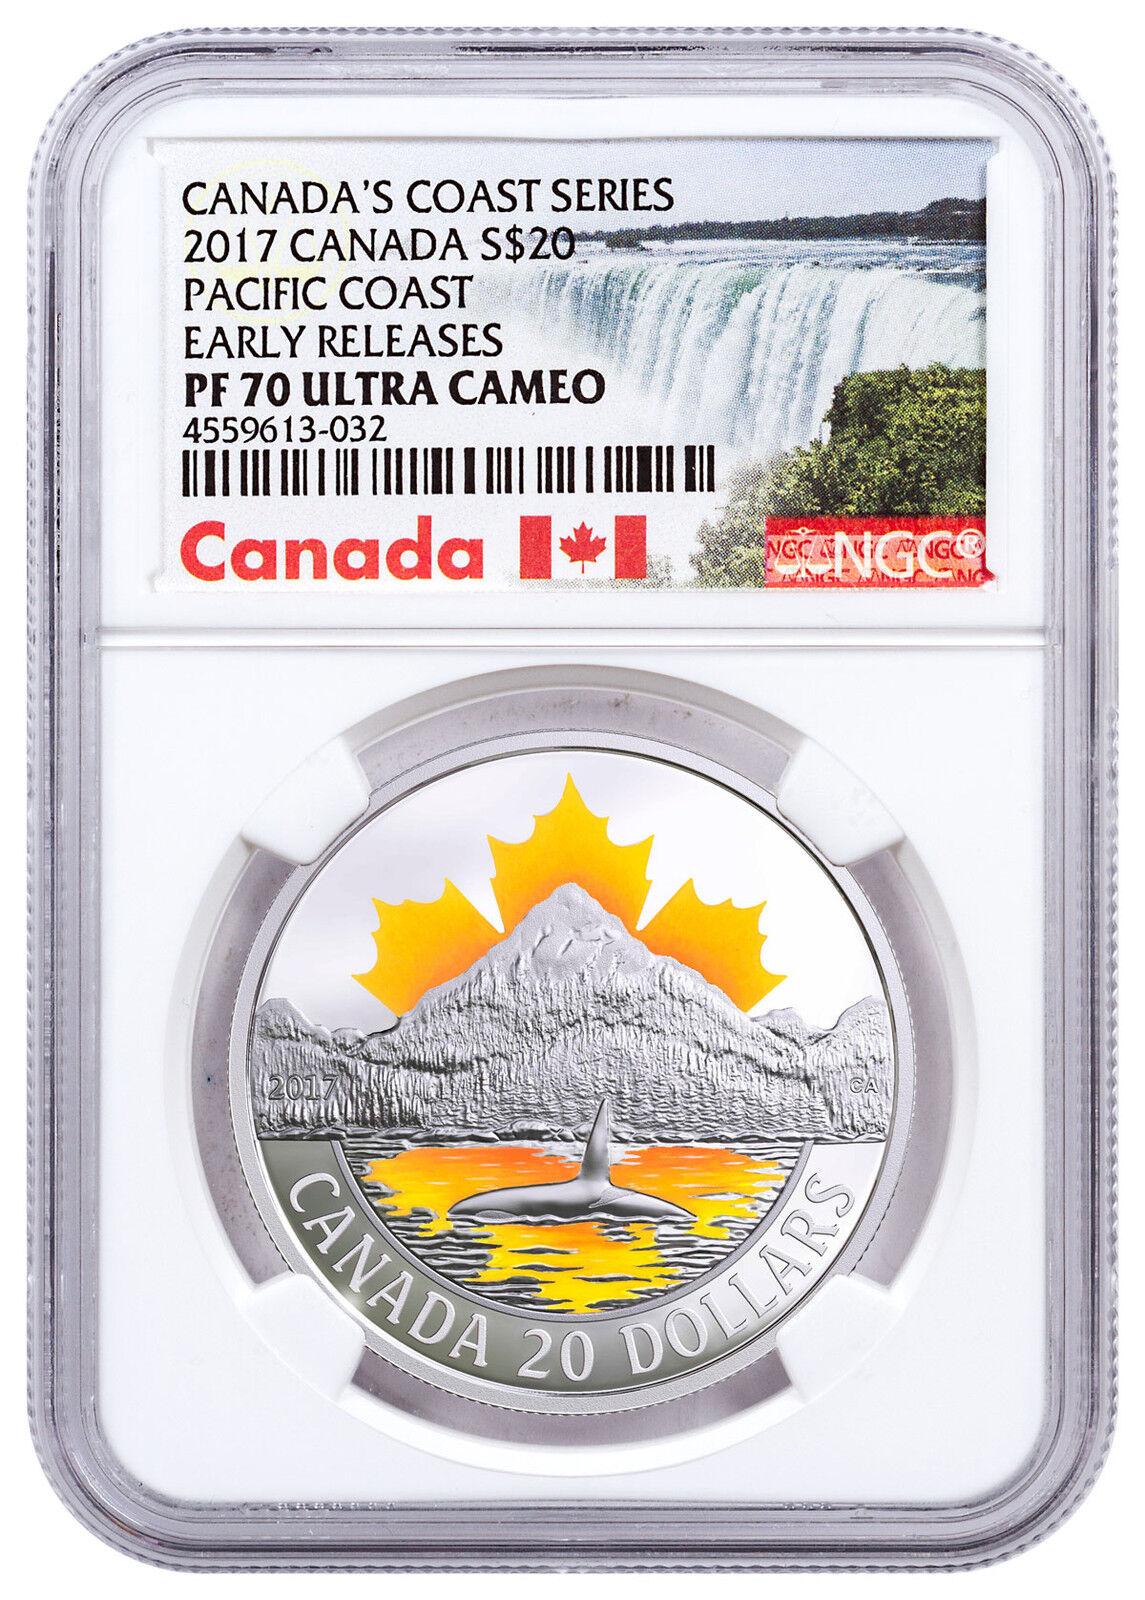 2017 Canada En Plein Air Springtime Gifts 1oz Silver $20 NGC PF70 UC ER SKU47639